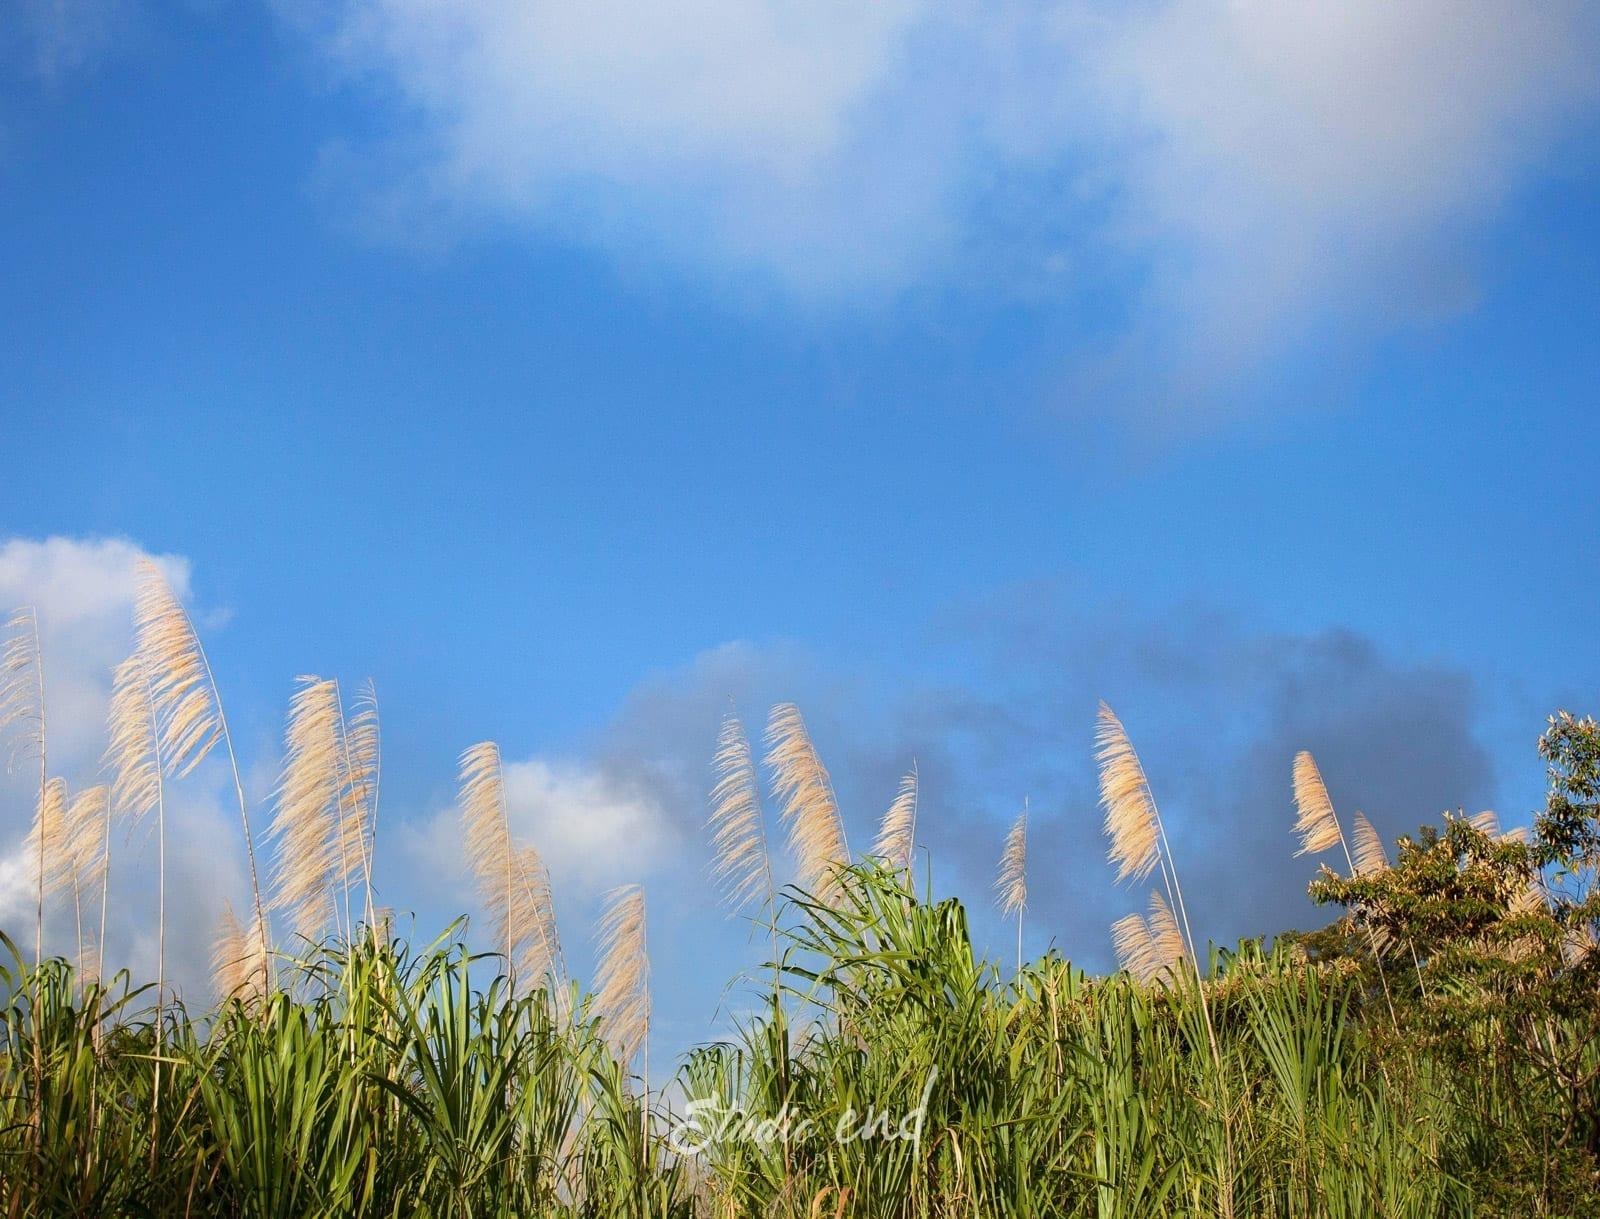 Photographe et reportage de voyage nature Costa Rica Nicolas Delsaut